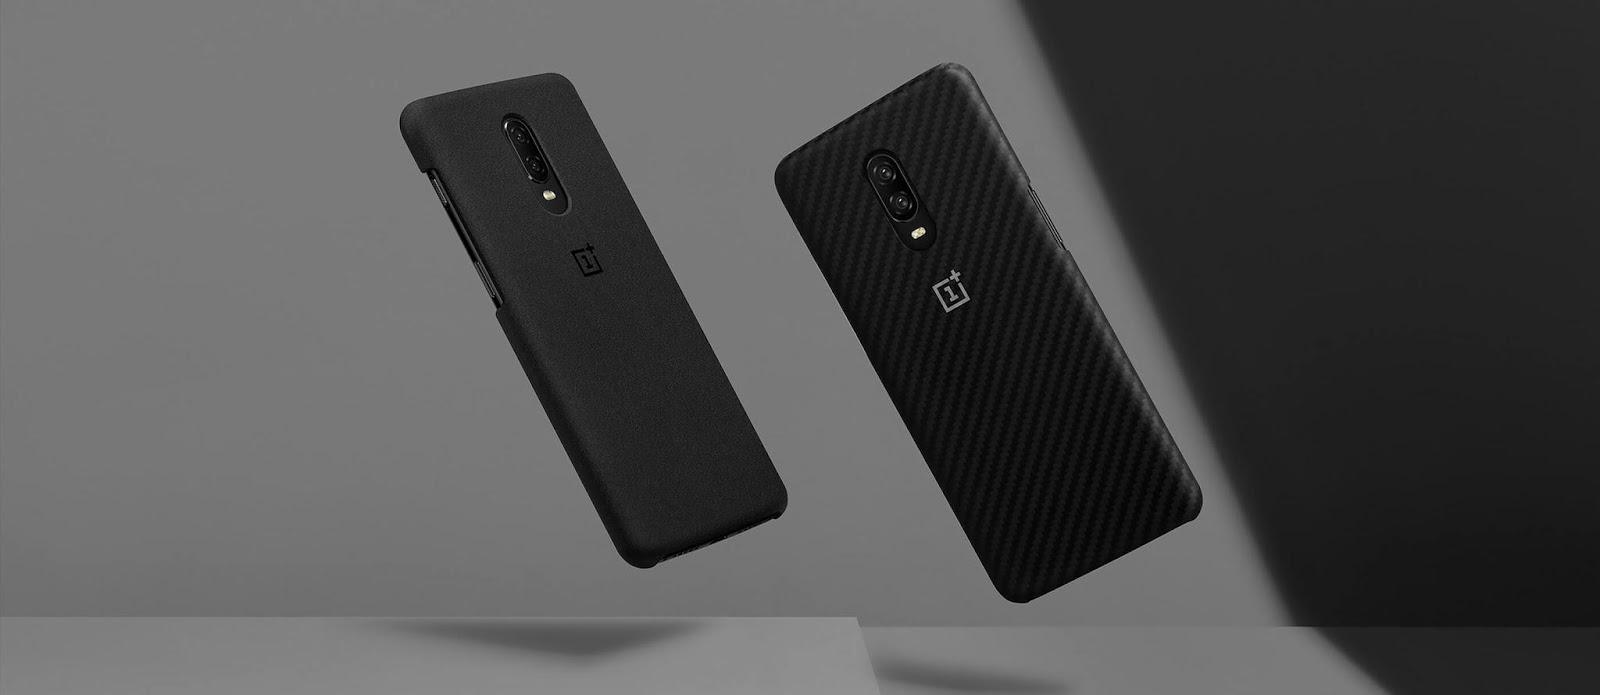 OnePlus-6T-Protective-Case-Sandstone